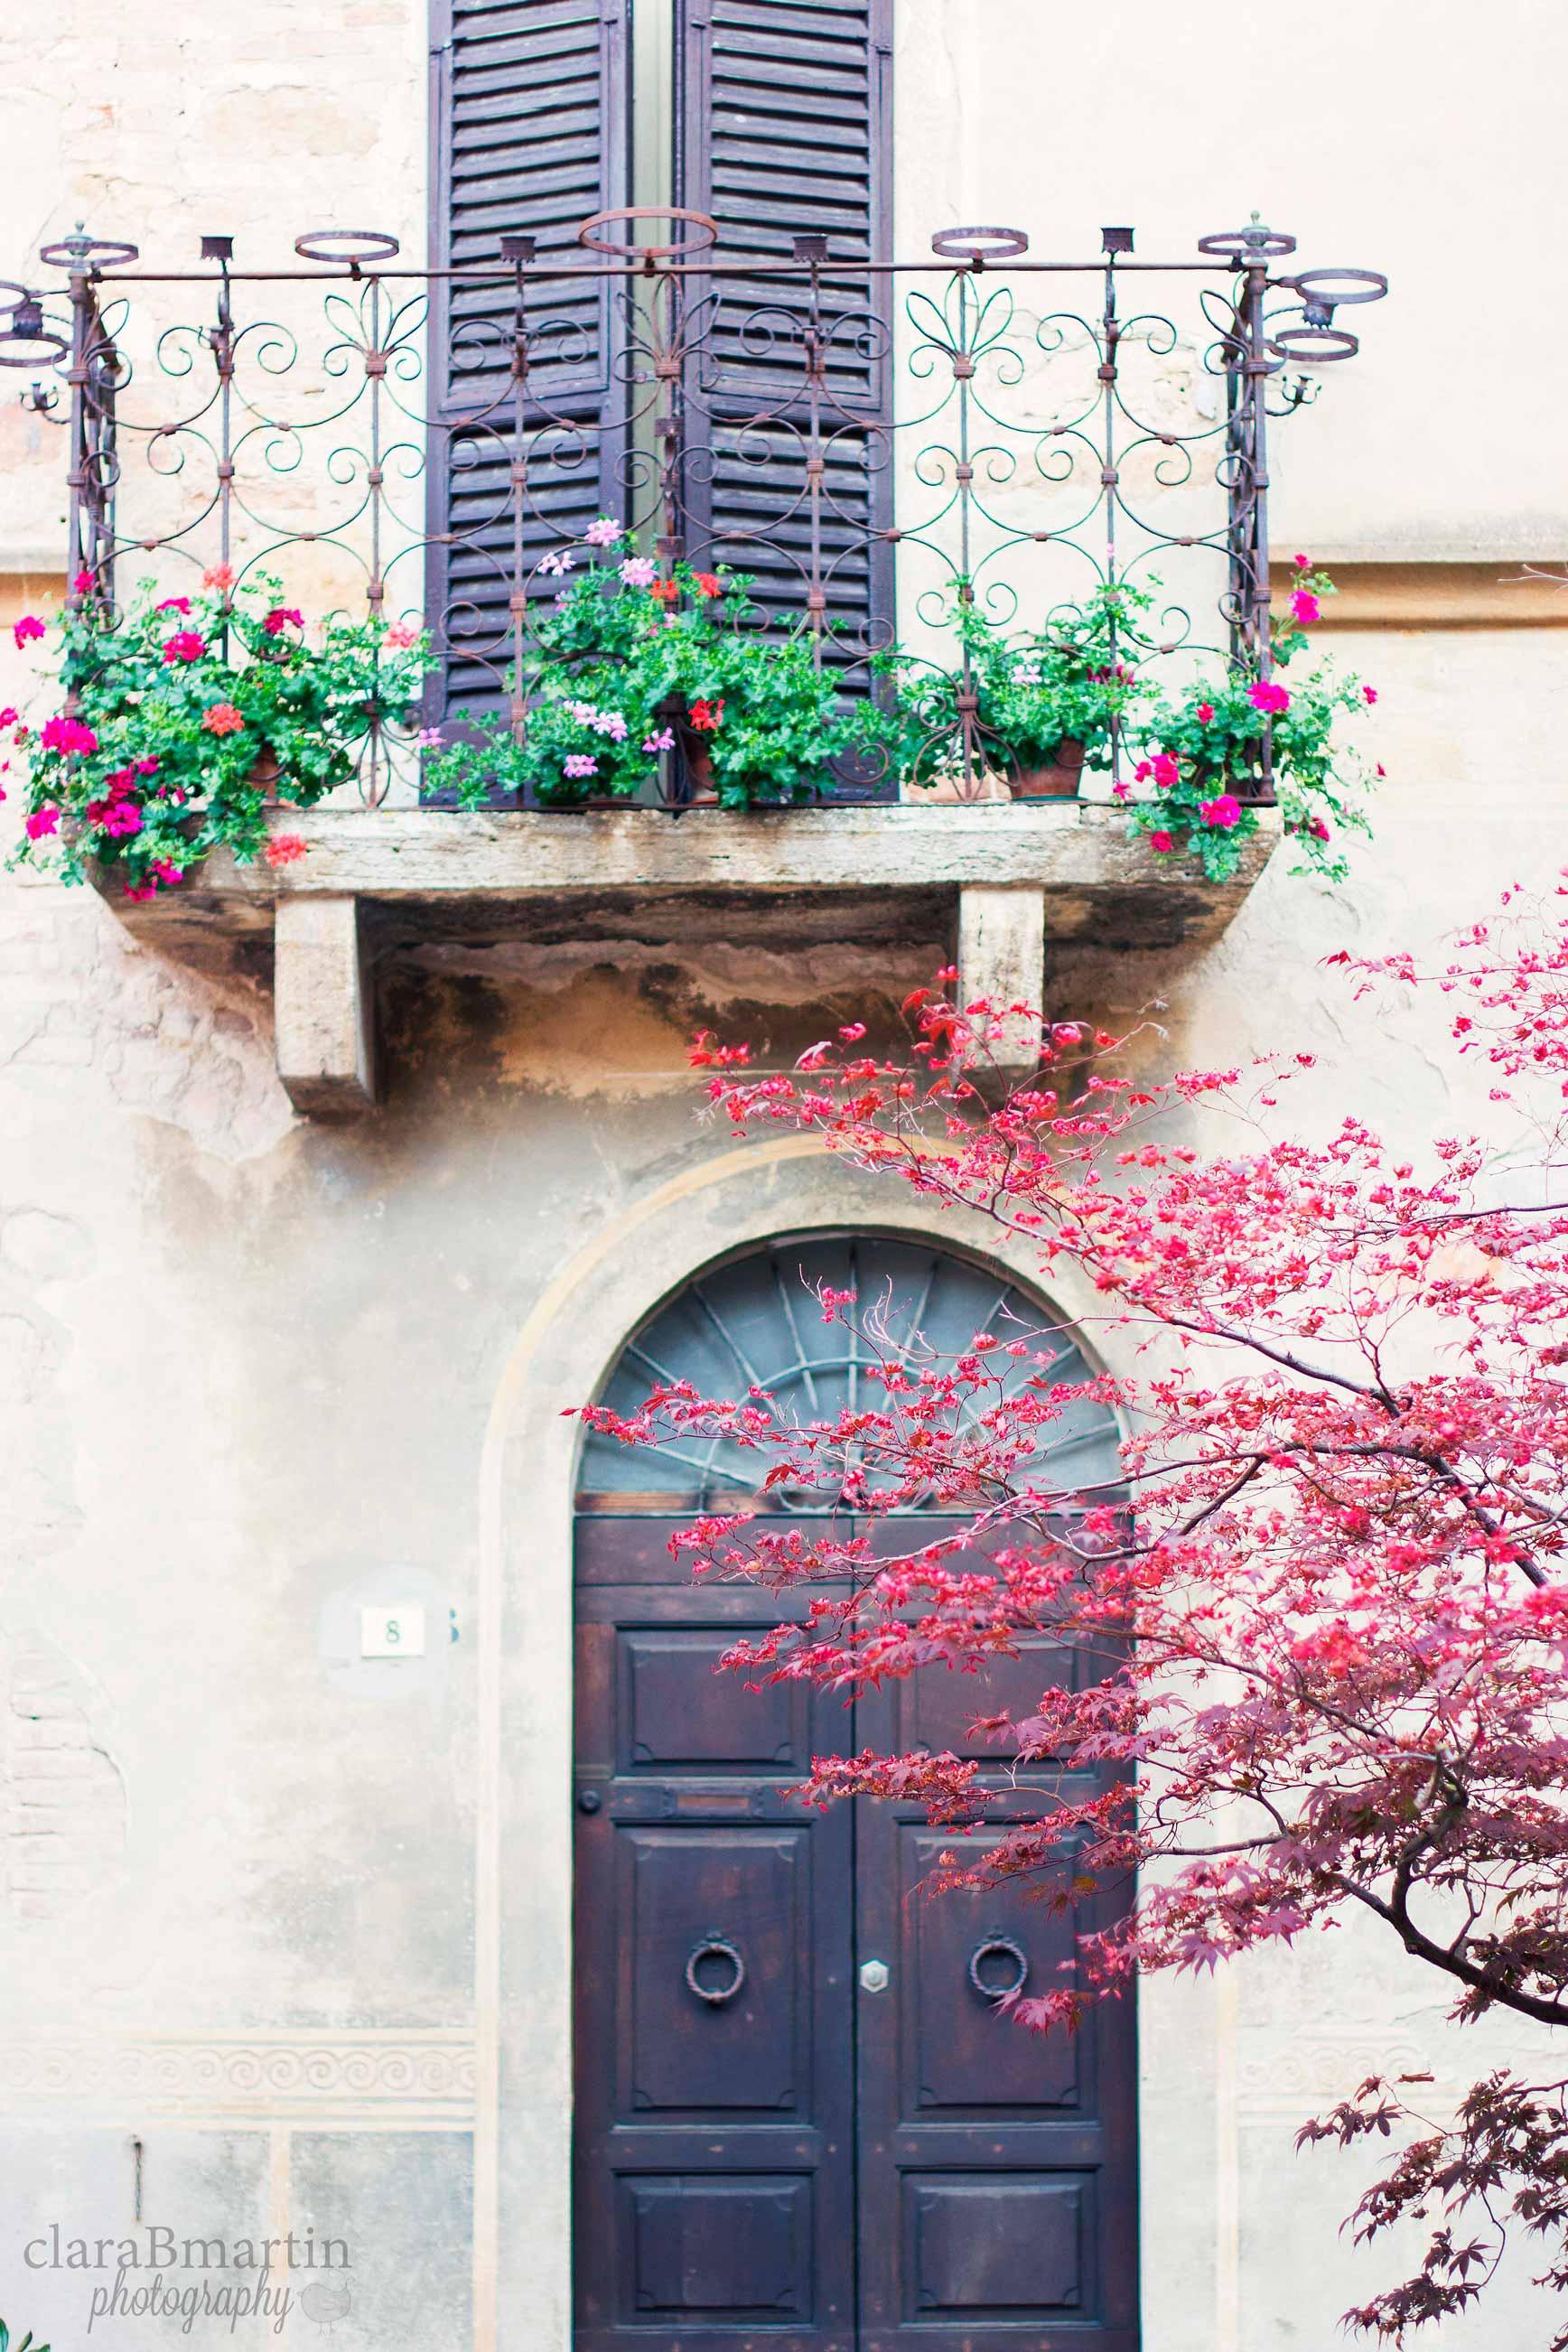 Toscana_claraBmartin15